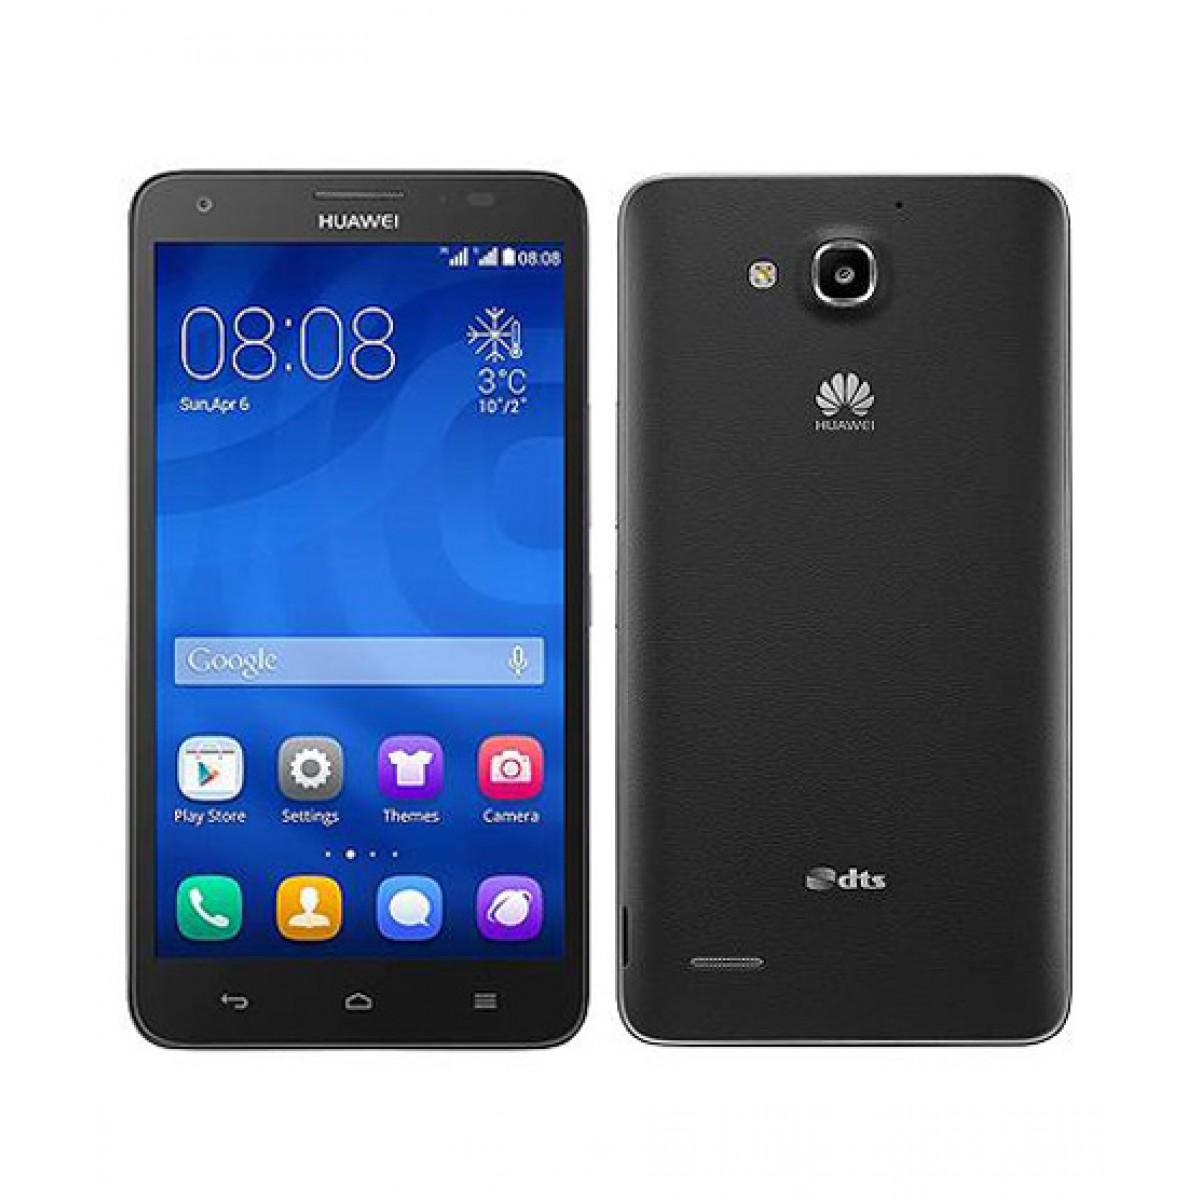 Huawei Ascend G750 3G Dual Sim Black